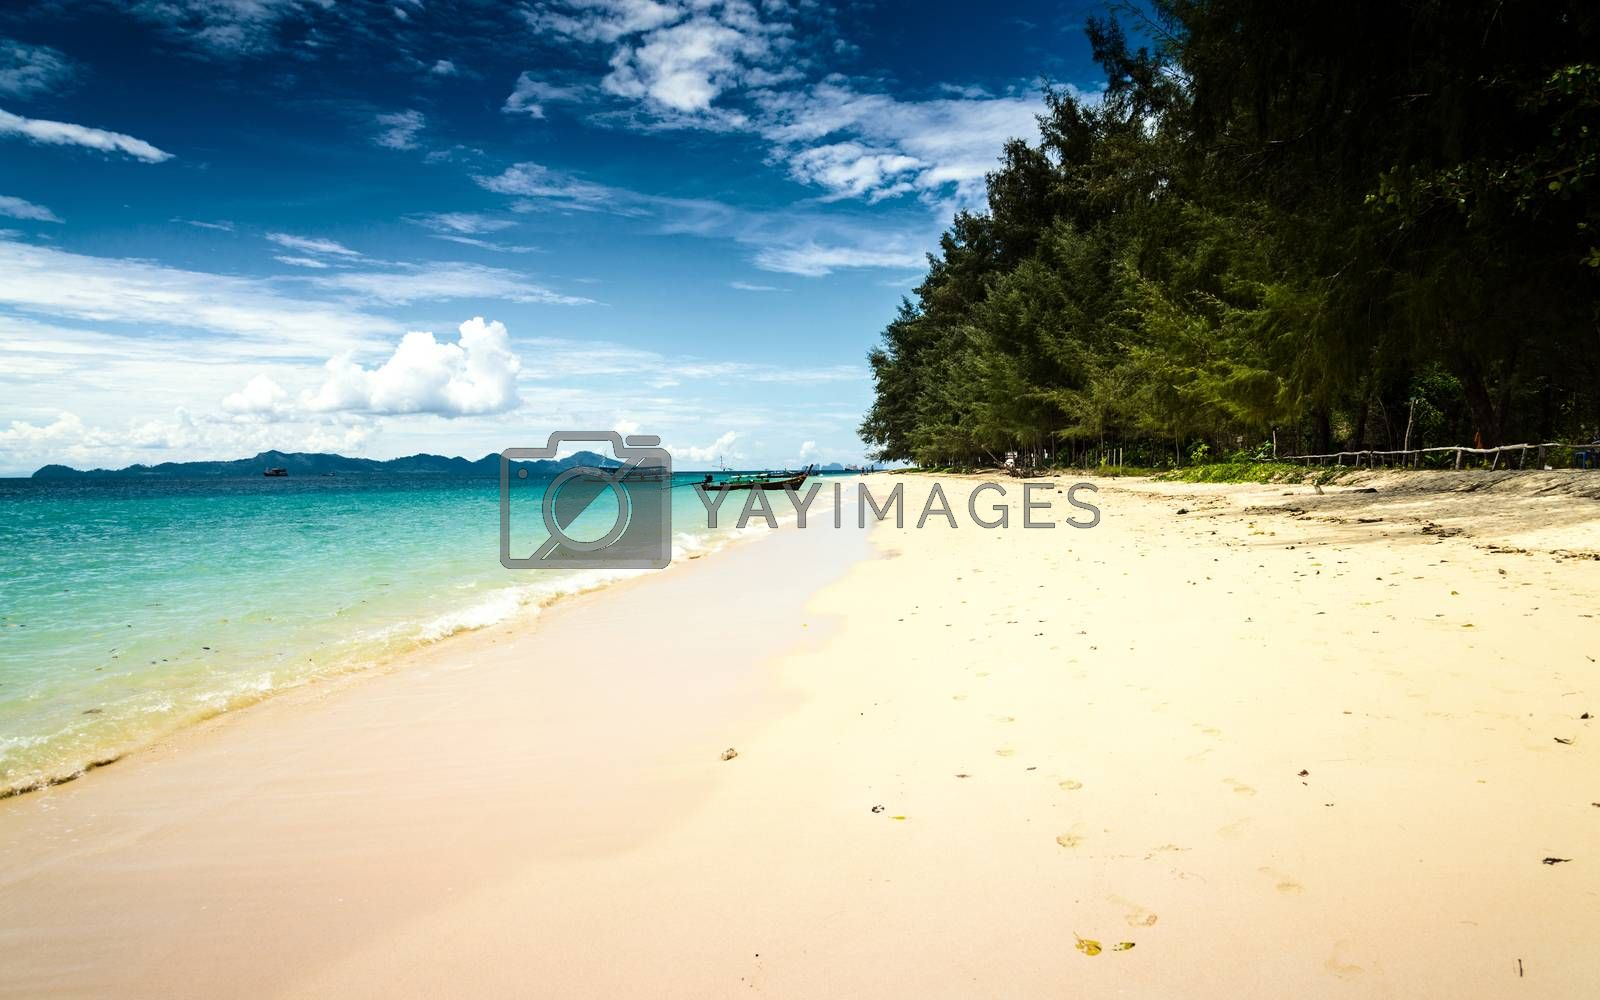 Kradan Island, an island in the Andaman Sea, Thailand by jakgree